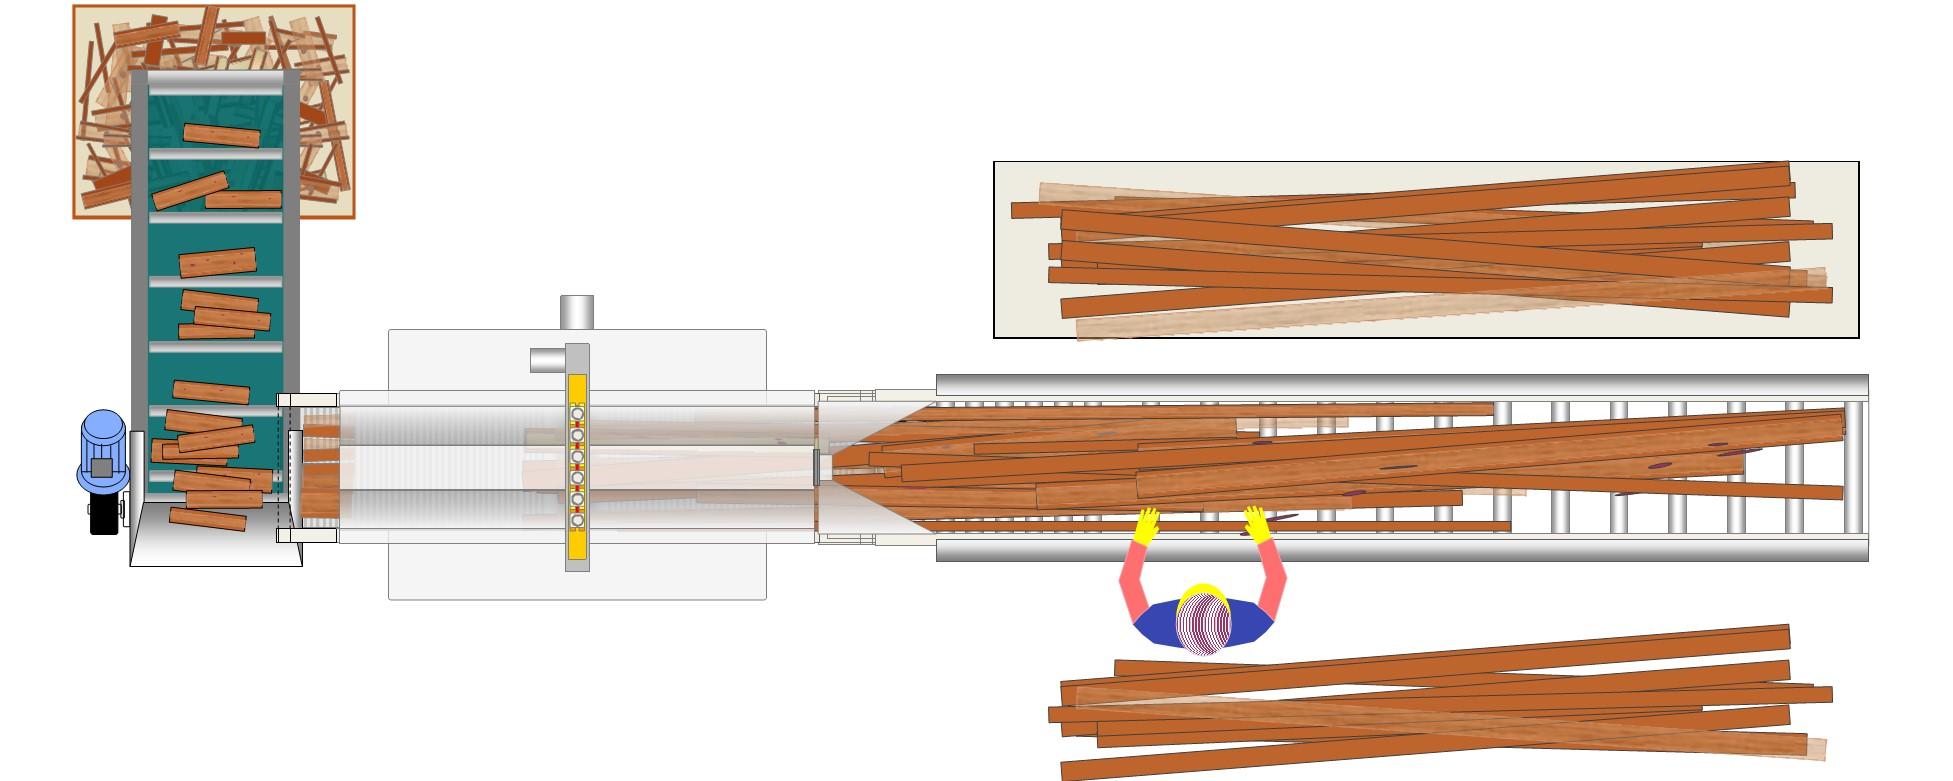 TRV 1600L - Concept 01